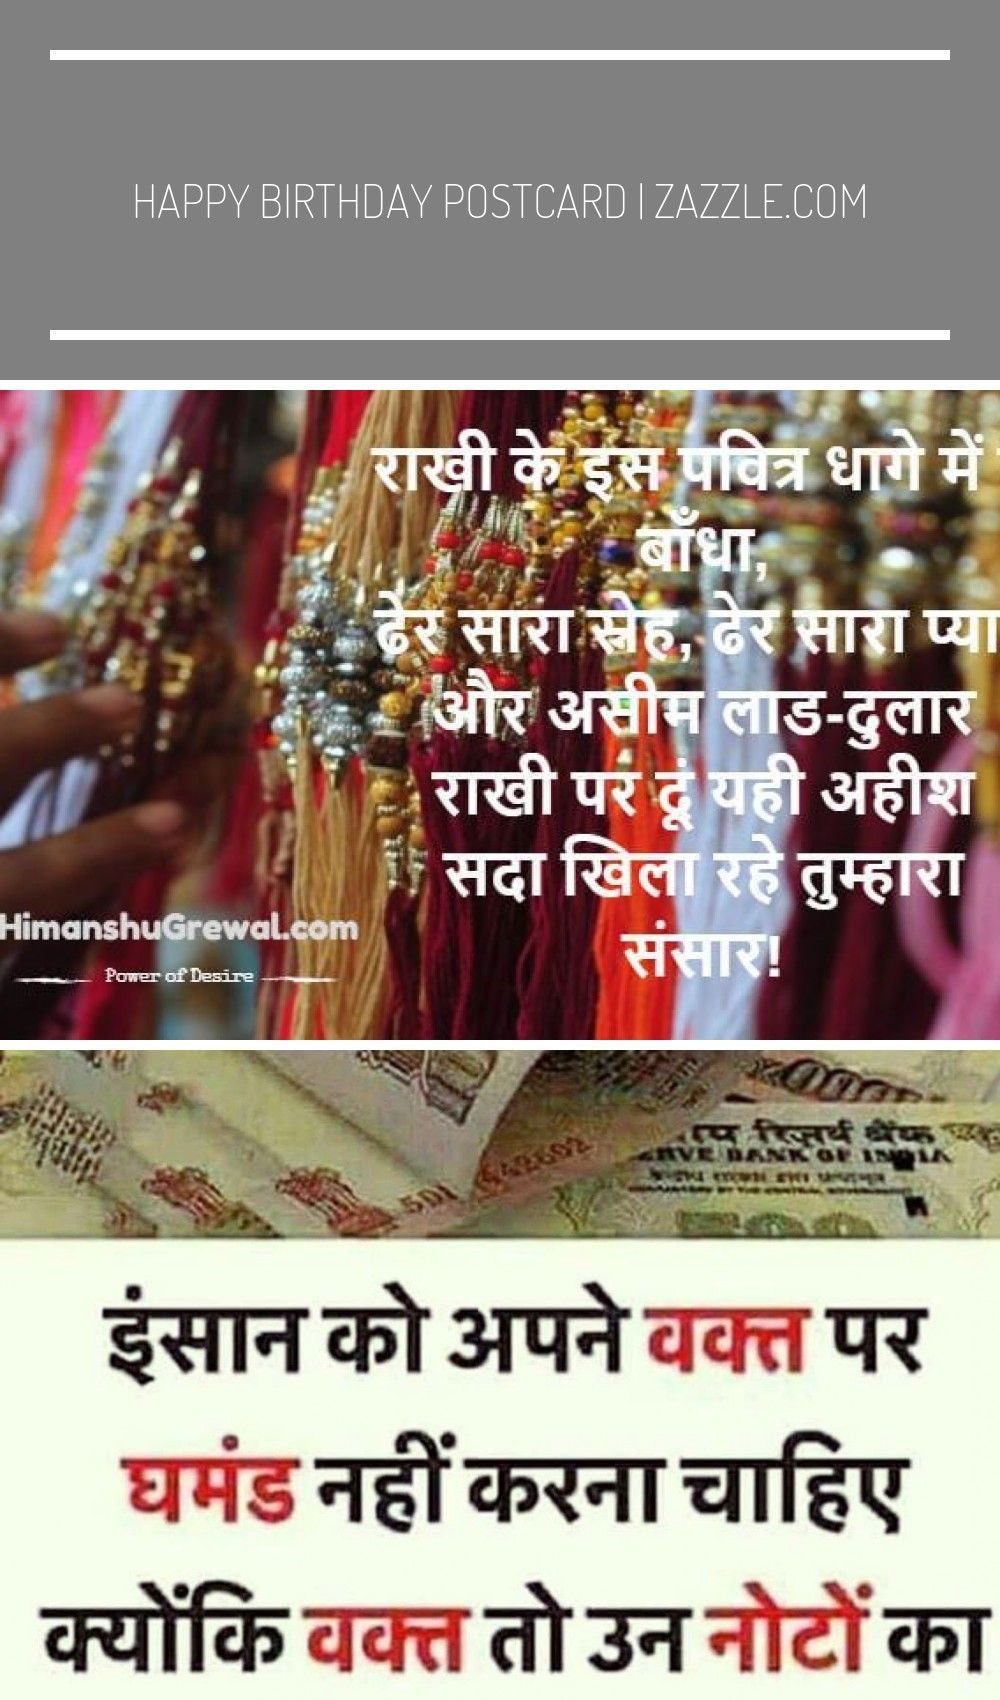 Nice Quotes on Raksha Bandhan in hindi font birthday